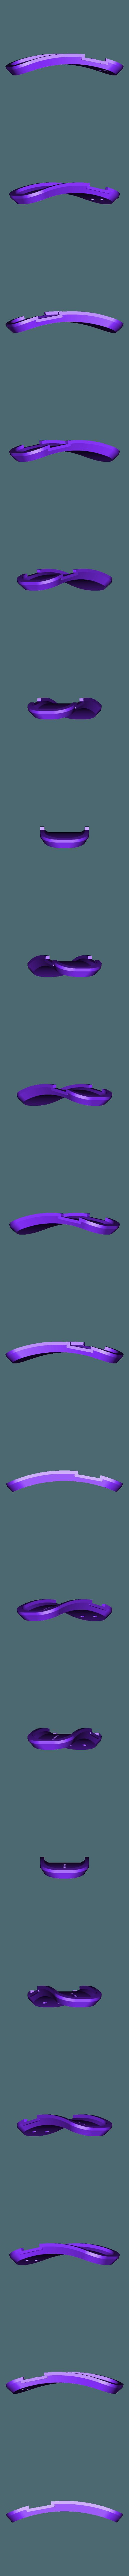 002.stl Download free STL file 3DvsCOVID19 CUSTOM PARAMETRIC Grasshopper Hands Free 3D Printed Door Openers to Help Against the Spread of Coronavirus • 3D print model, Othmane